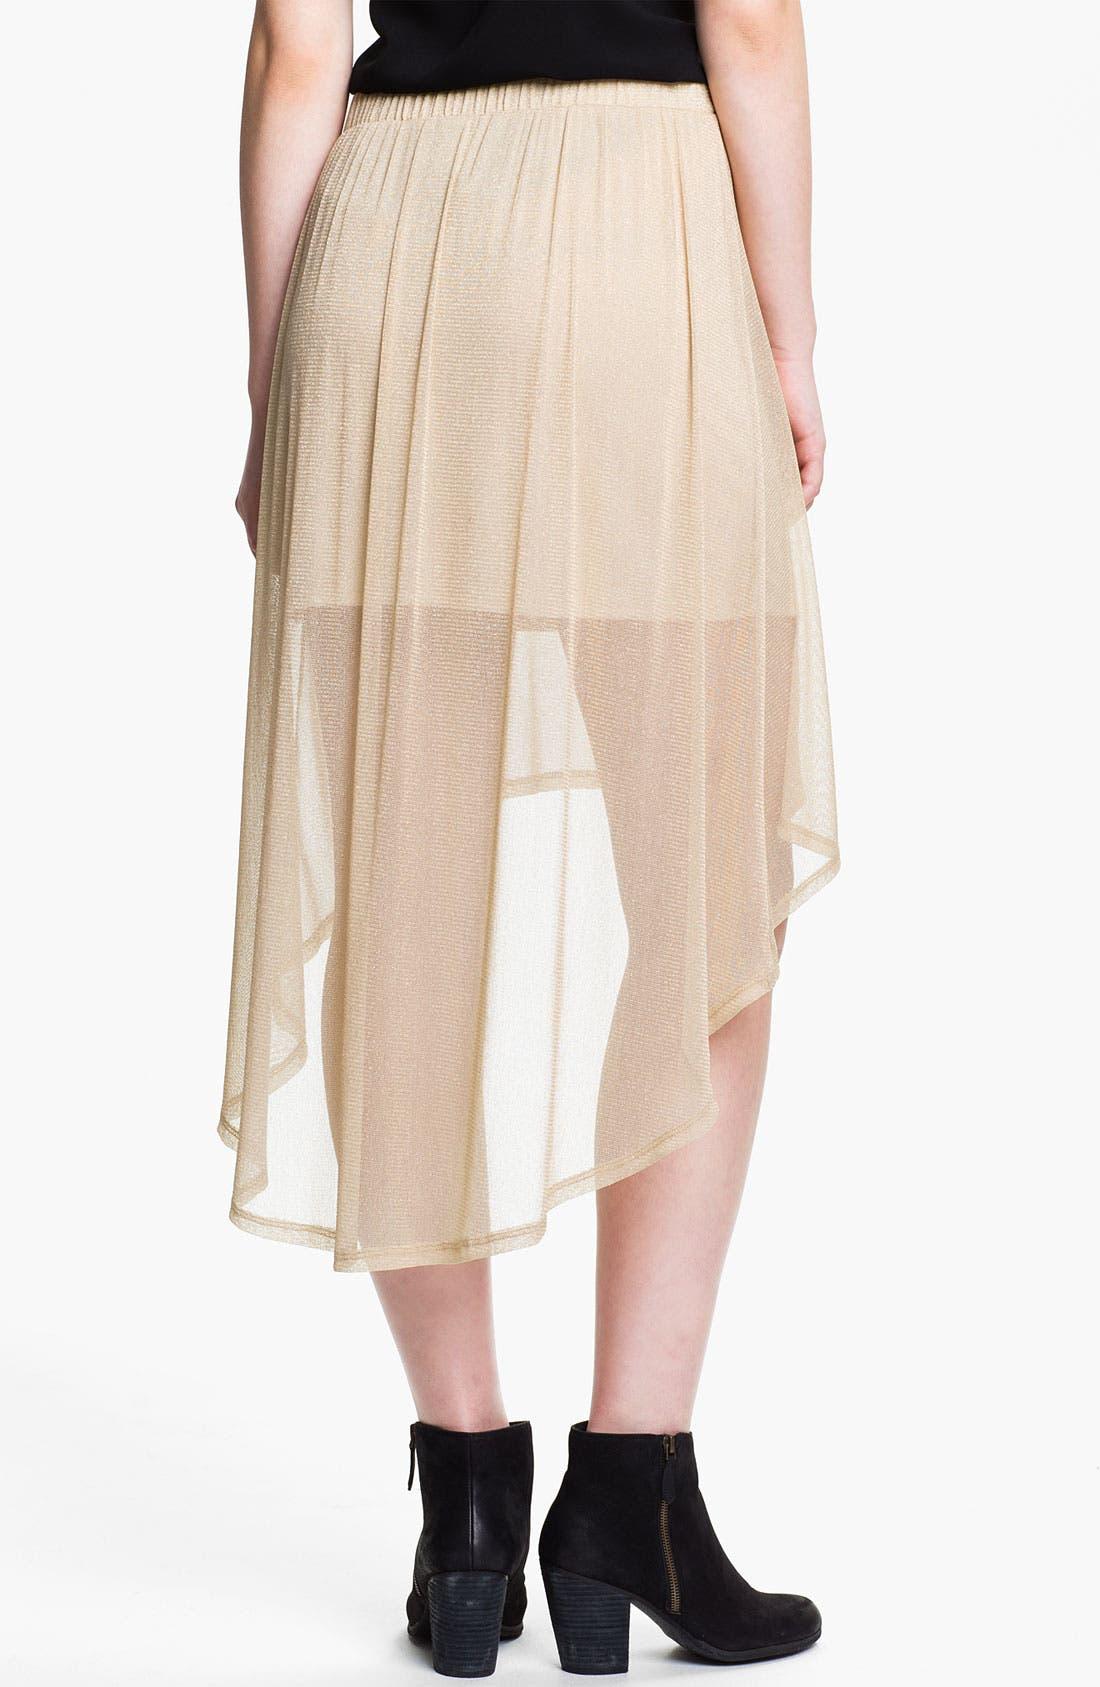 Alternate Image 2  - h.i.p. Metallic Half-Sheer High/Low Skirt (Juniors)